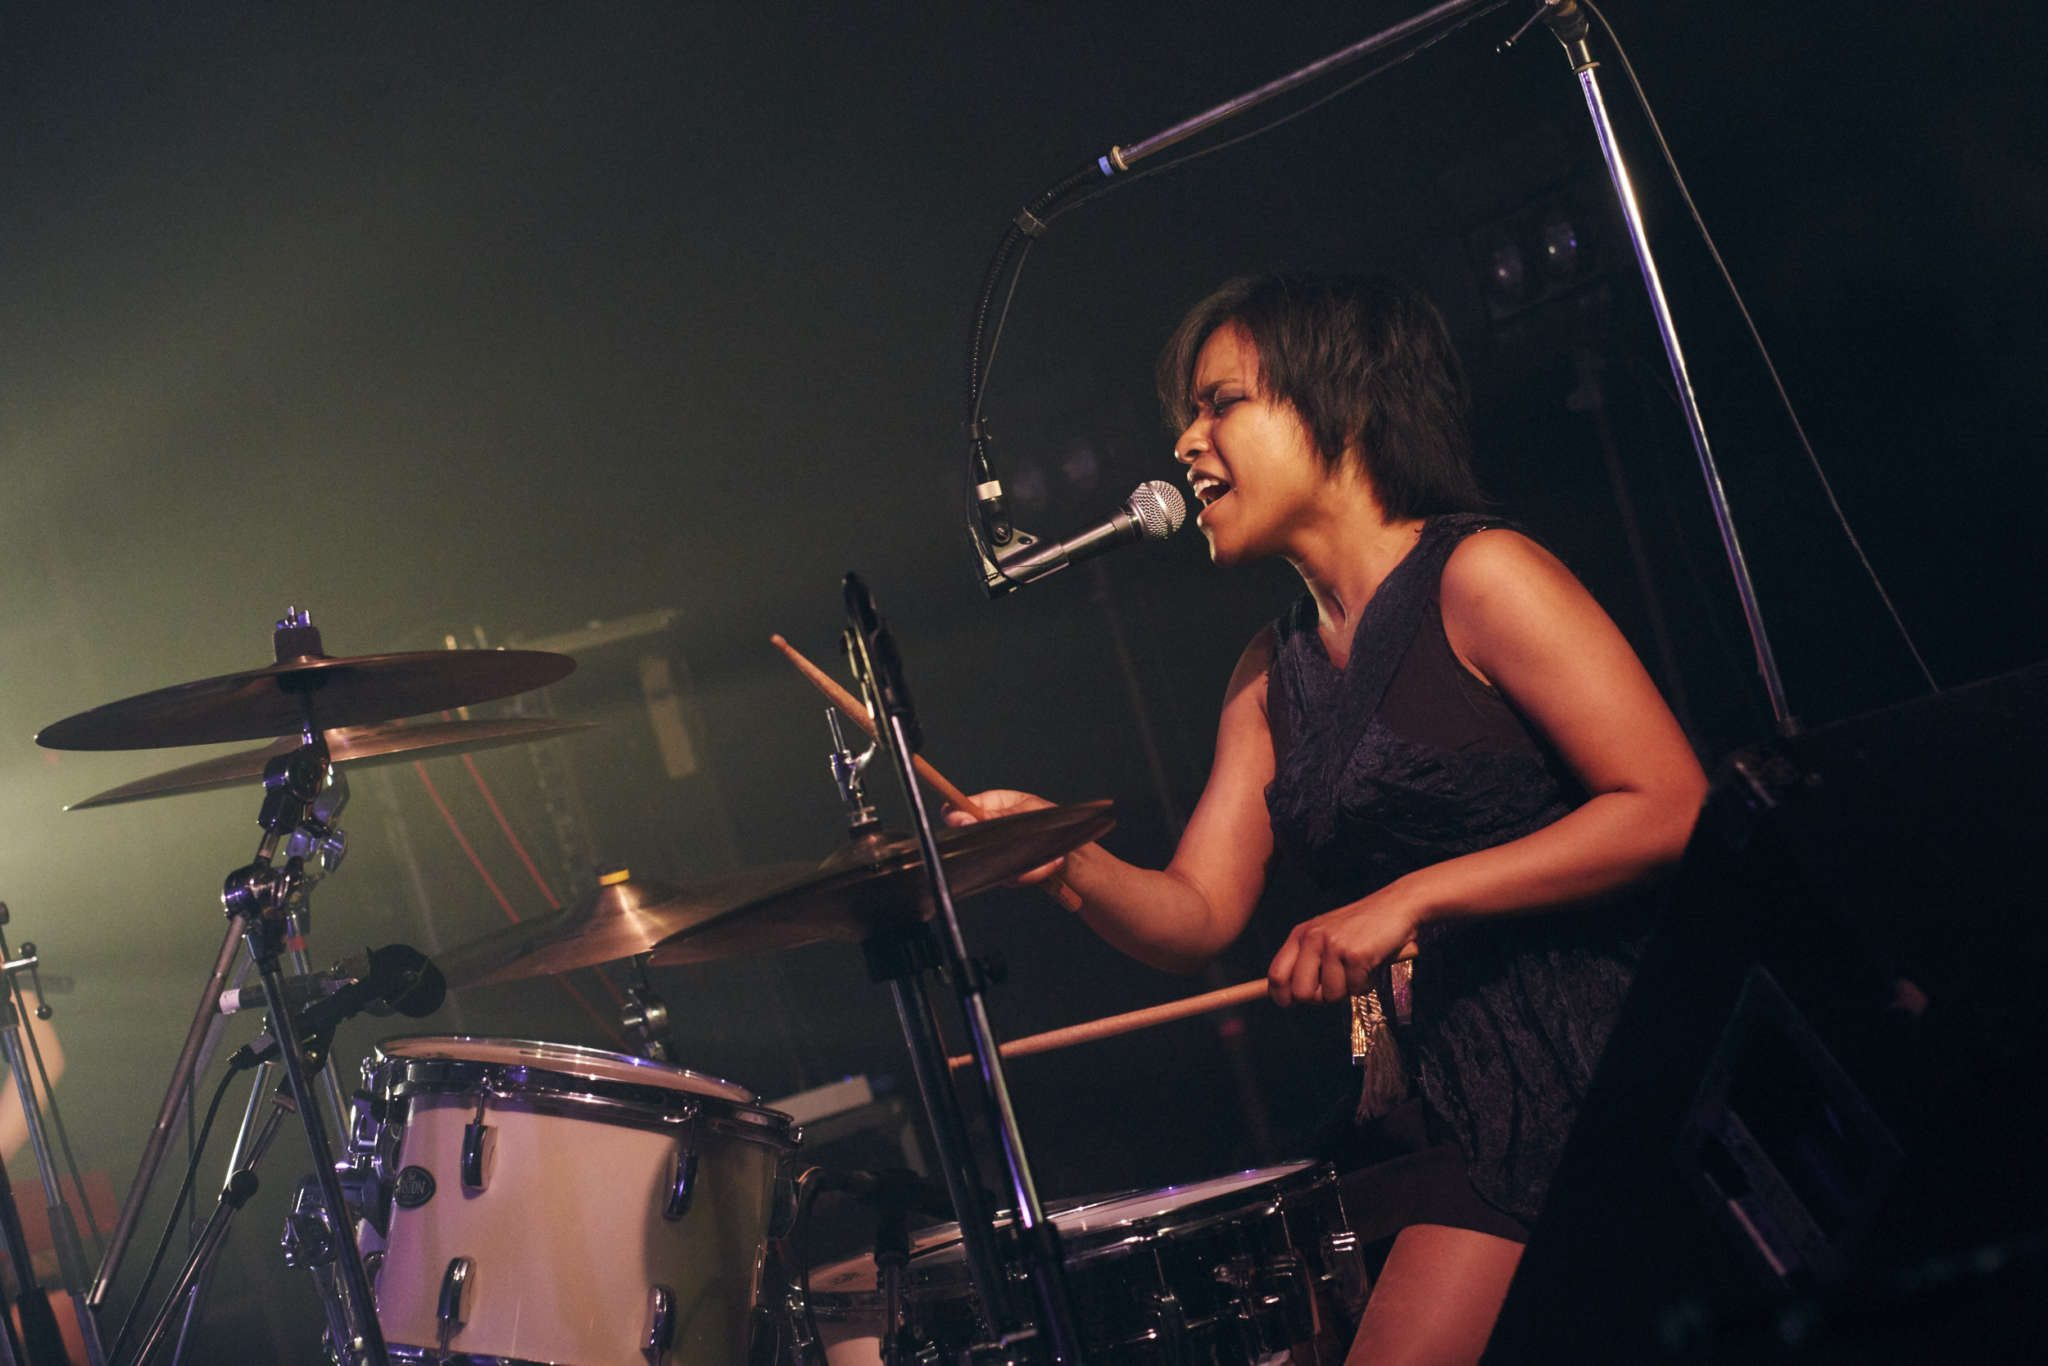 À la batterie, - Photographe : Nakano Shuuya (中野修也)